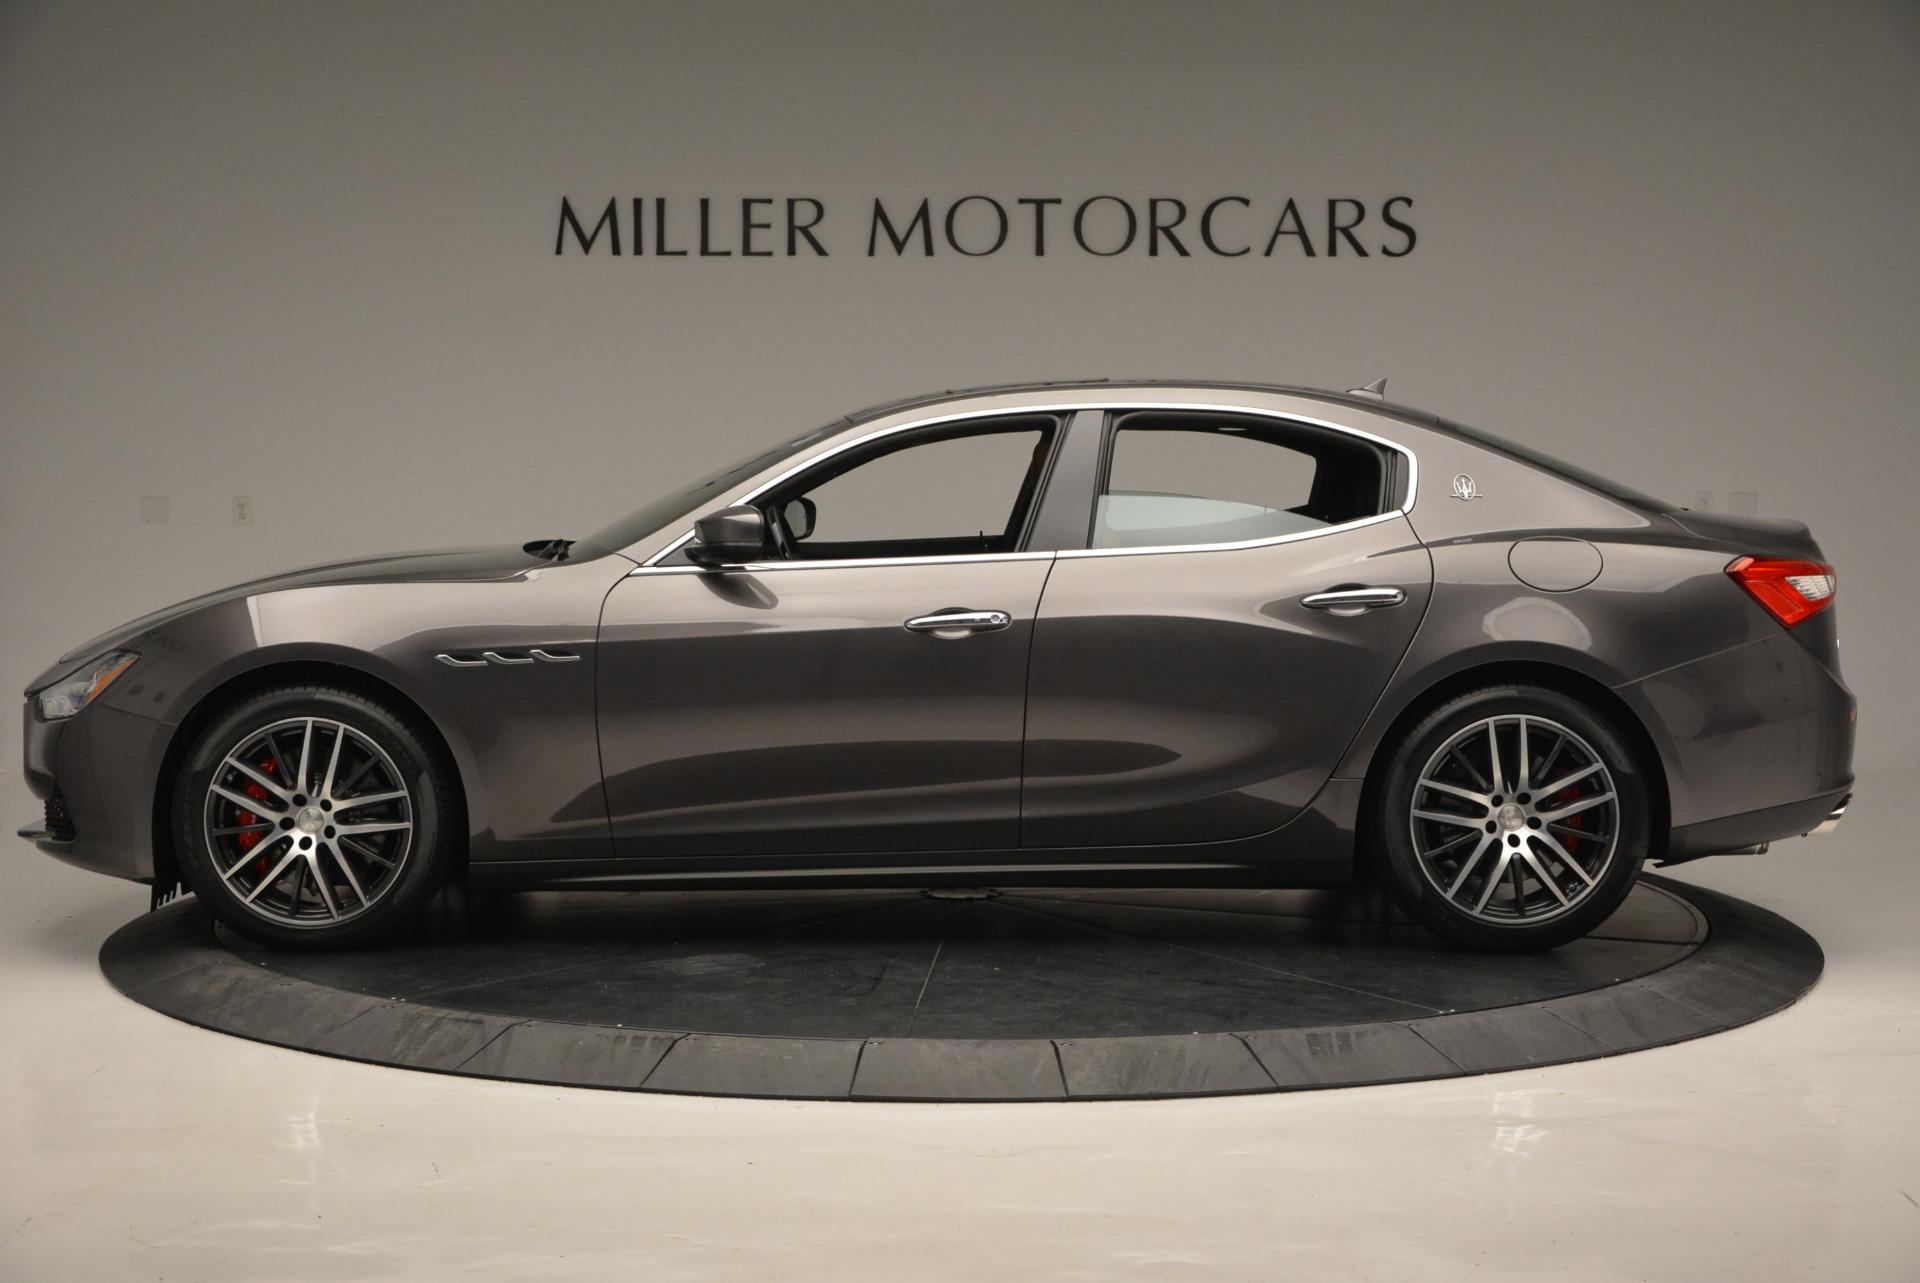 Used 2018 Maserati Ghibli S Q4 For Sale In Westport, CT 1566_p3